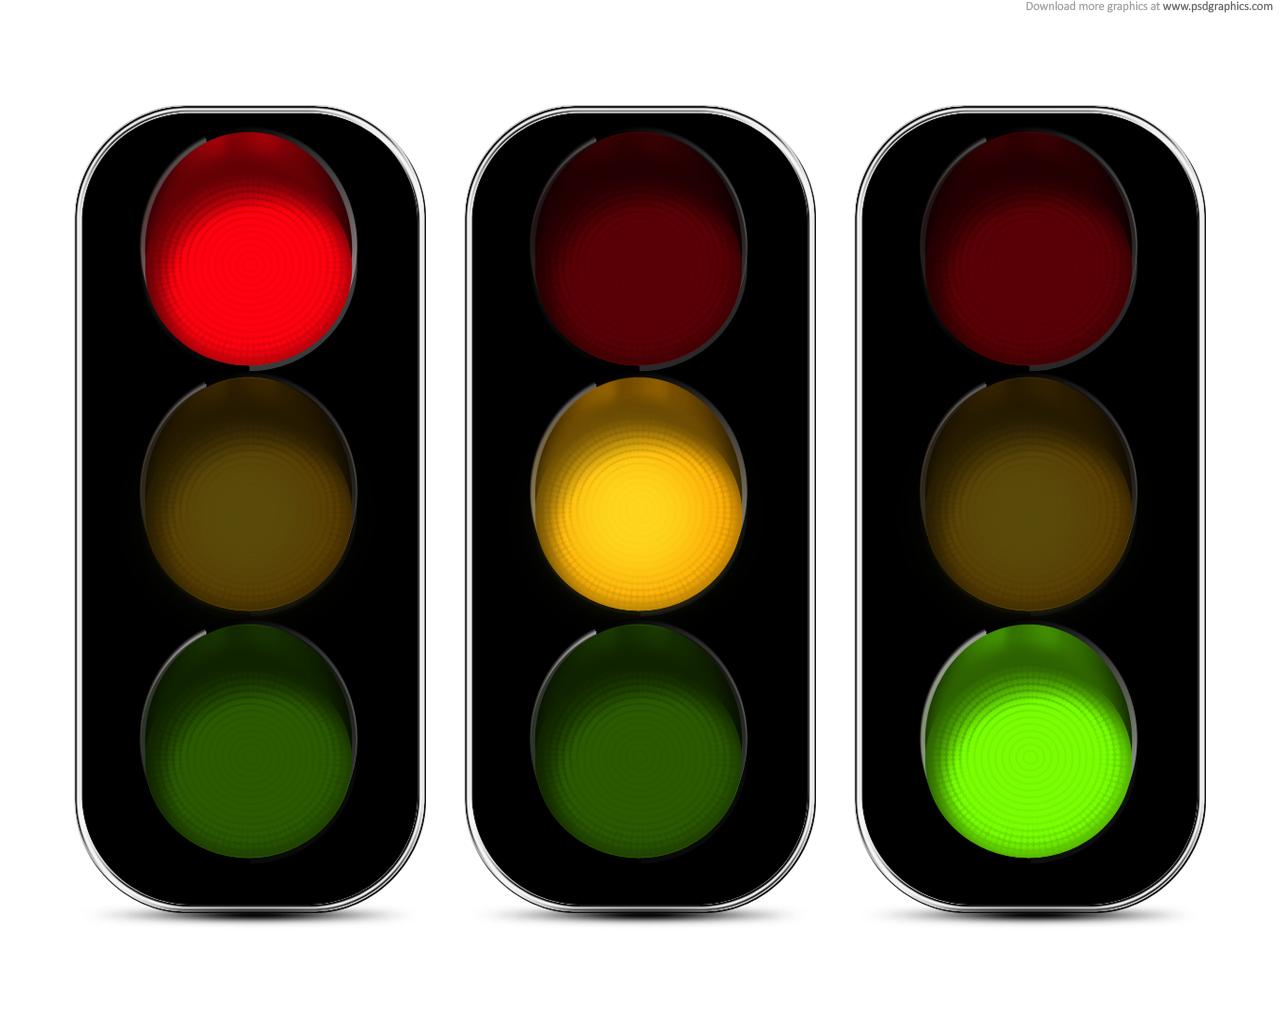 Traffic Lights Icon Psd Psdgraphics-Traffic Lights Icon Psd Psdgraphics-16